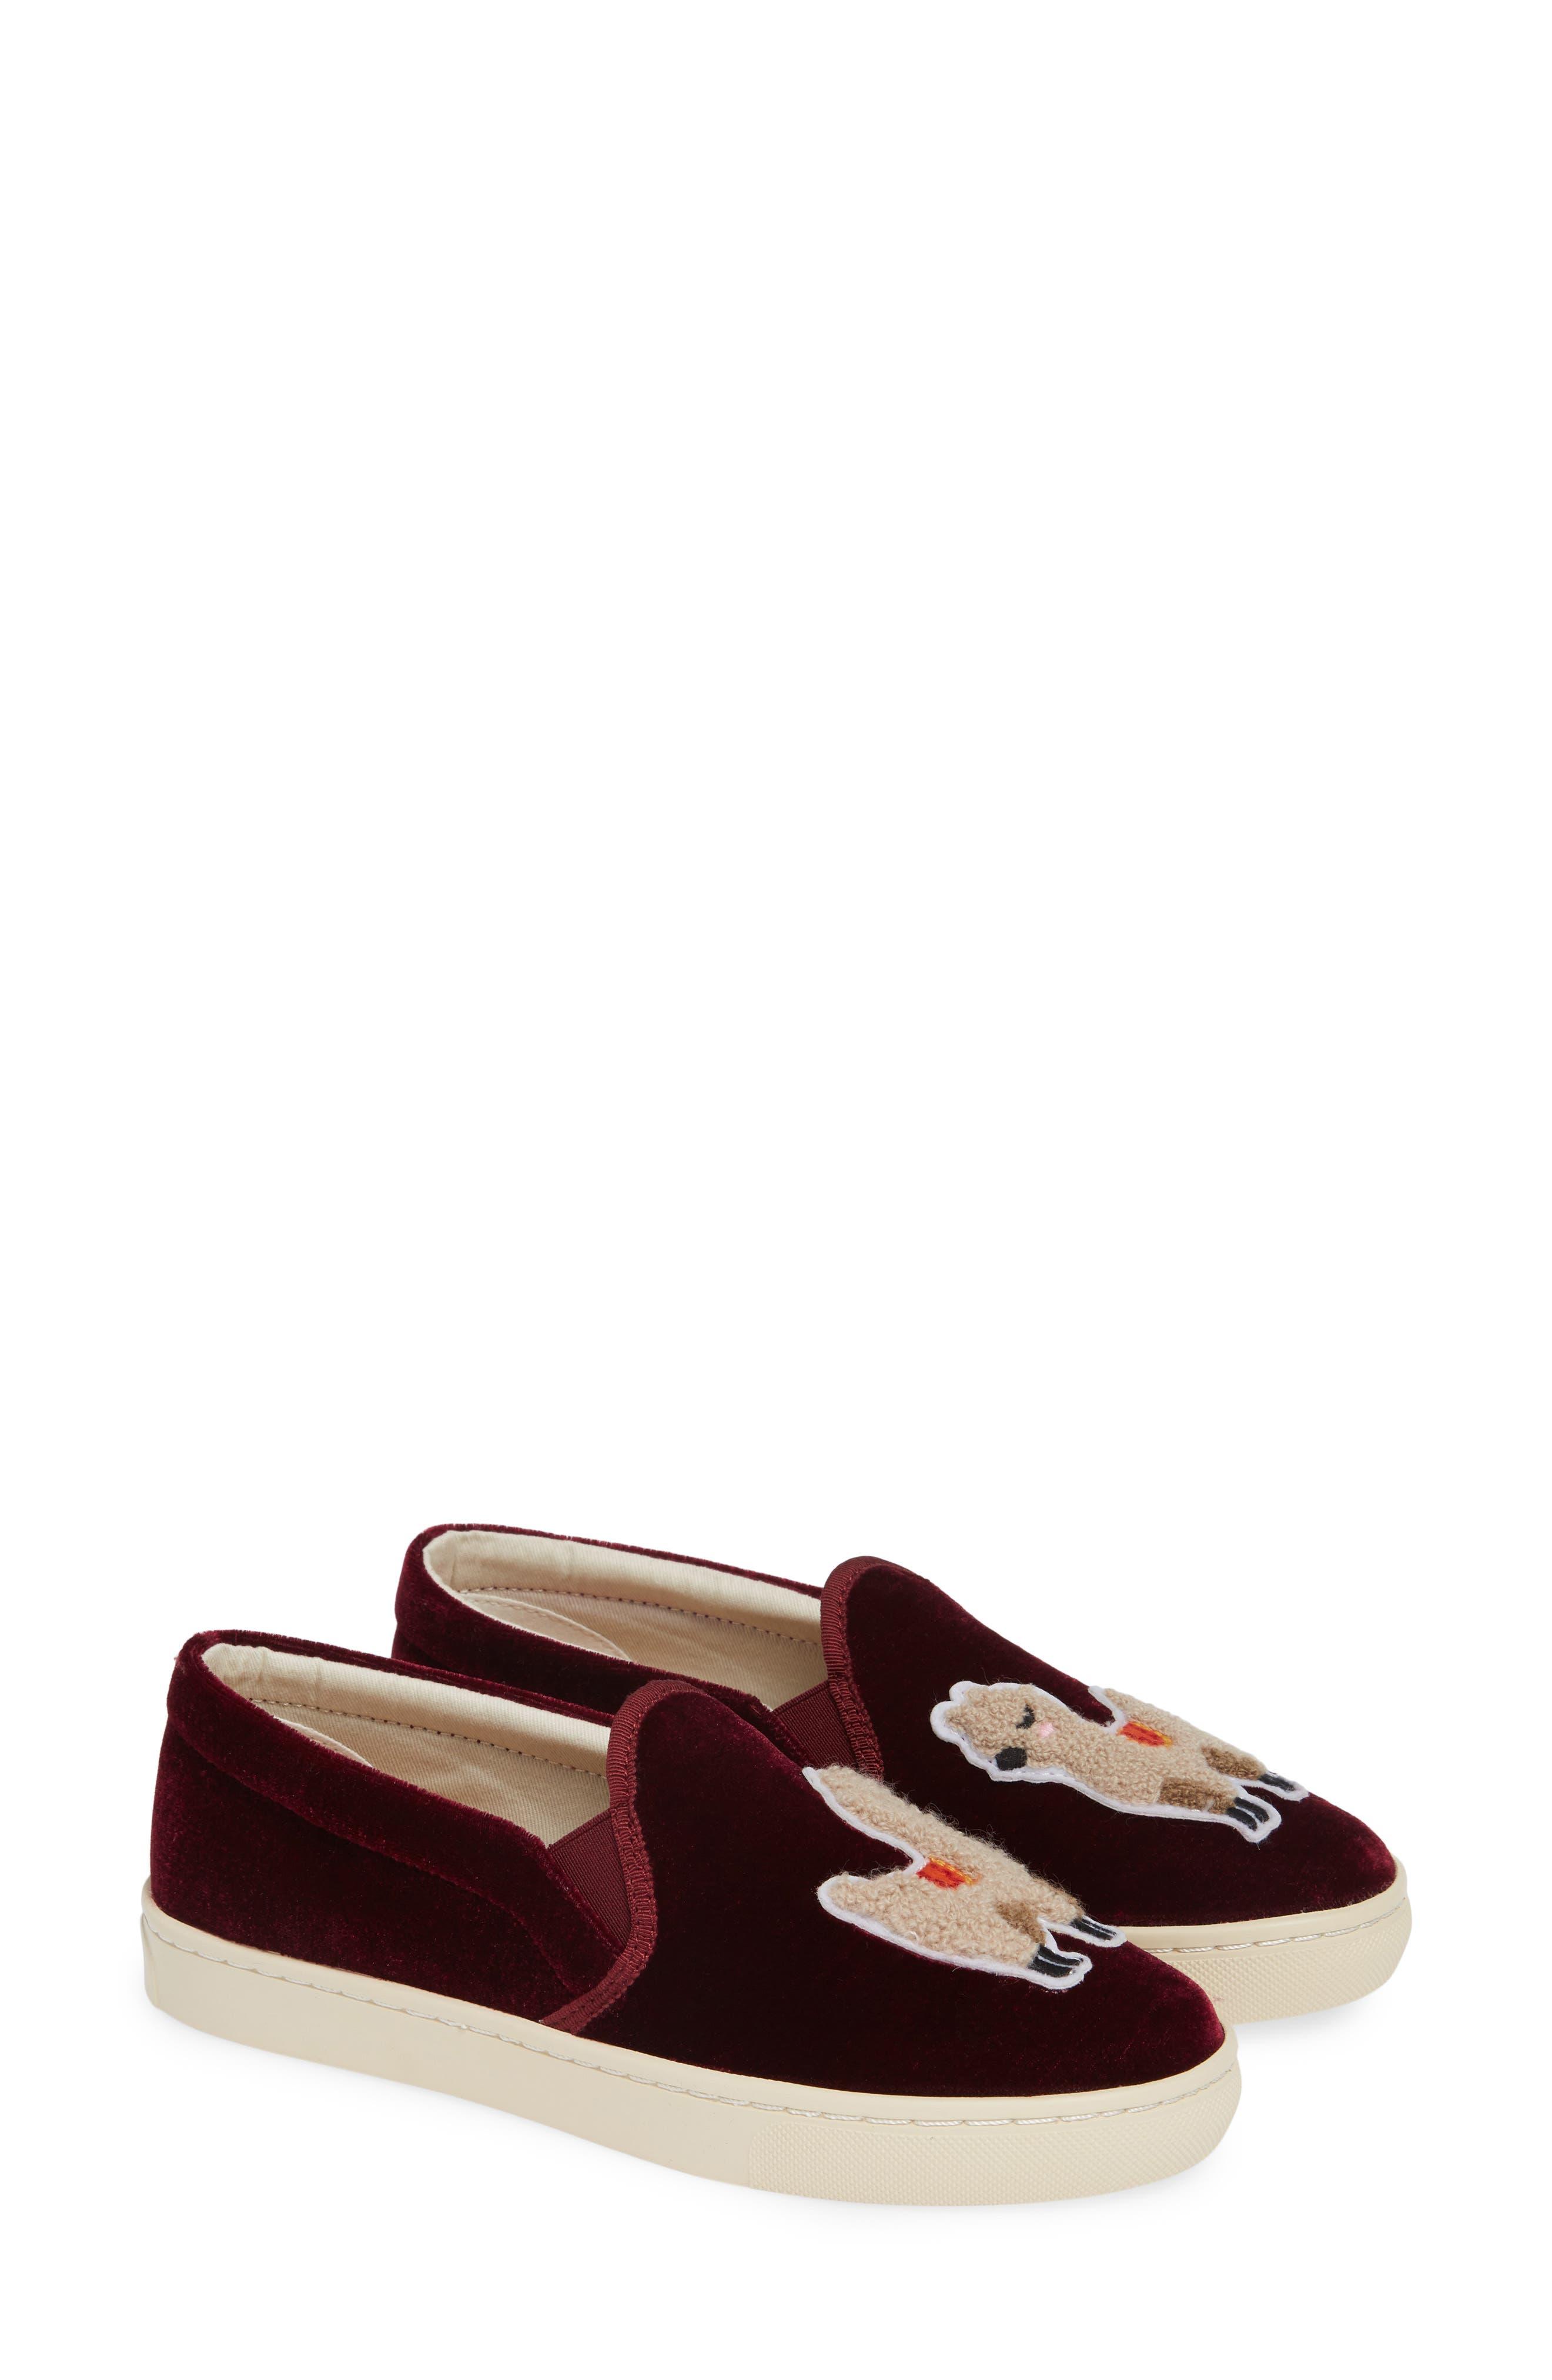 Velvet Llama Sneaker,                             Main thumbnail 1, color,                             931